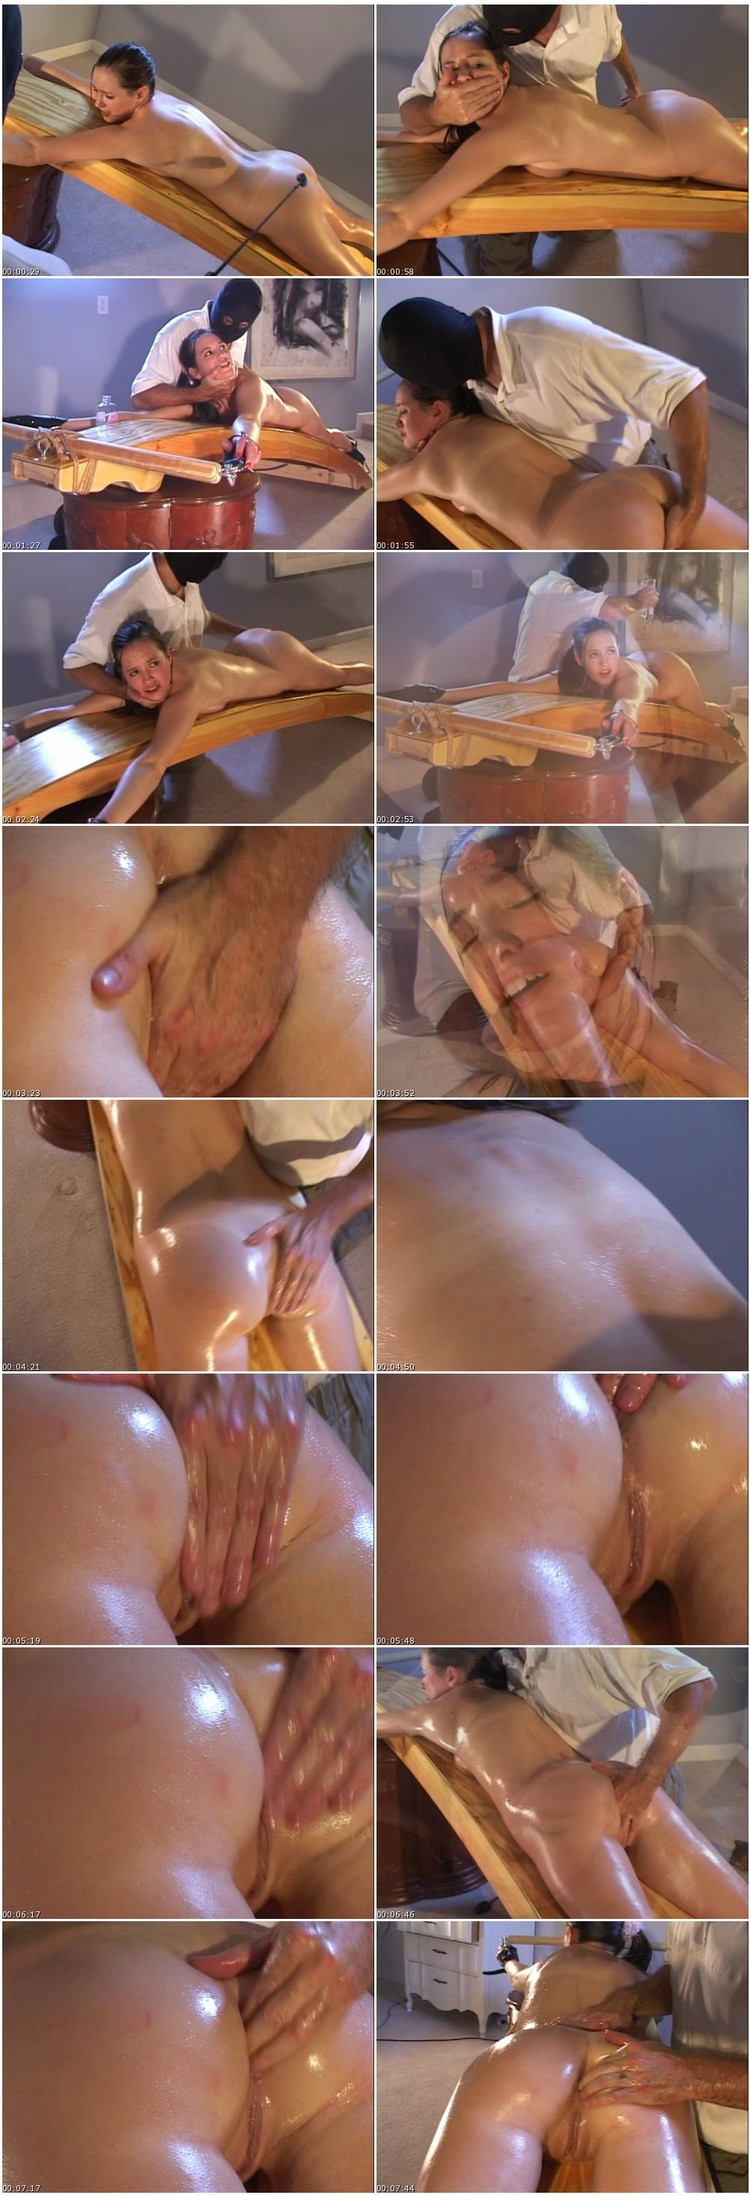 Rape fantasies theme porn pic